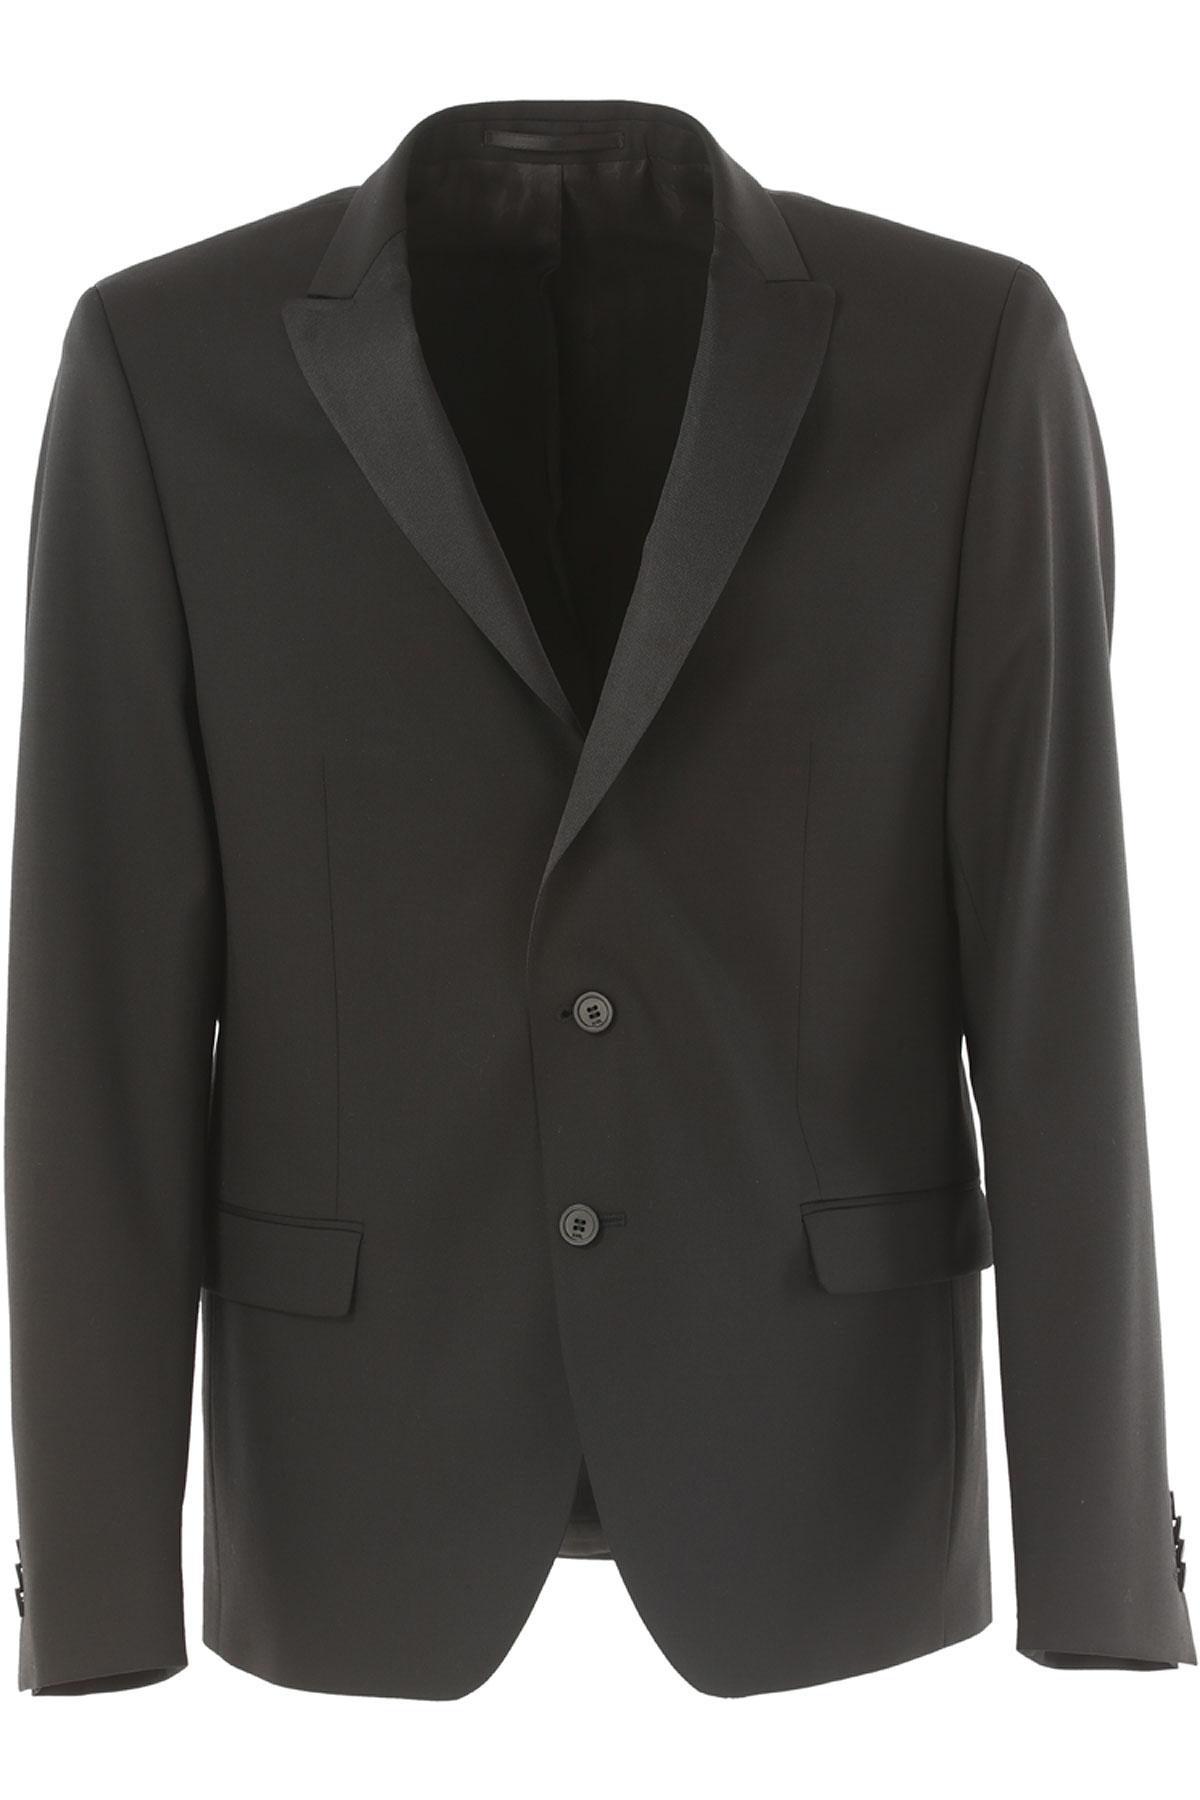 Image of Karl Lagerfeld Blazer for Men, Sport Coat On Sale, Black, Wool, 2017, L M